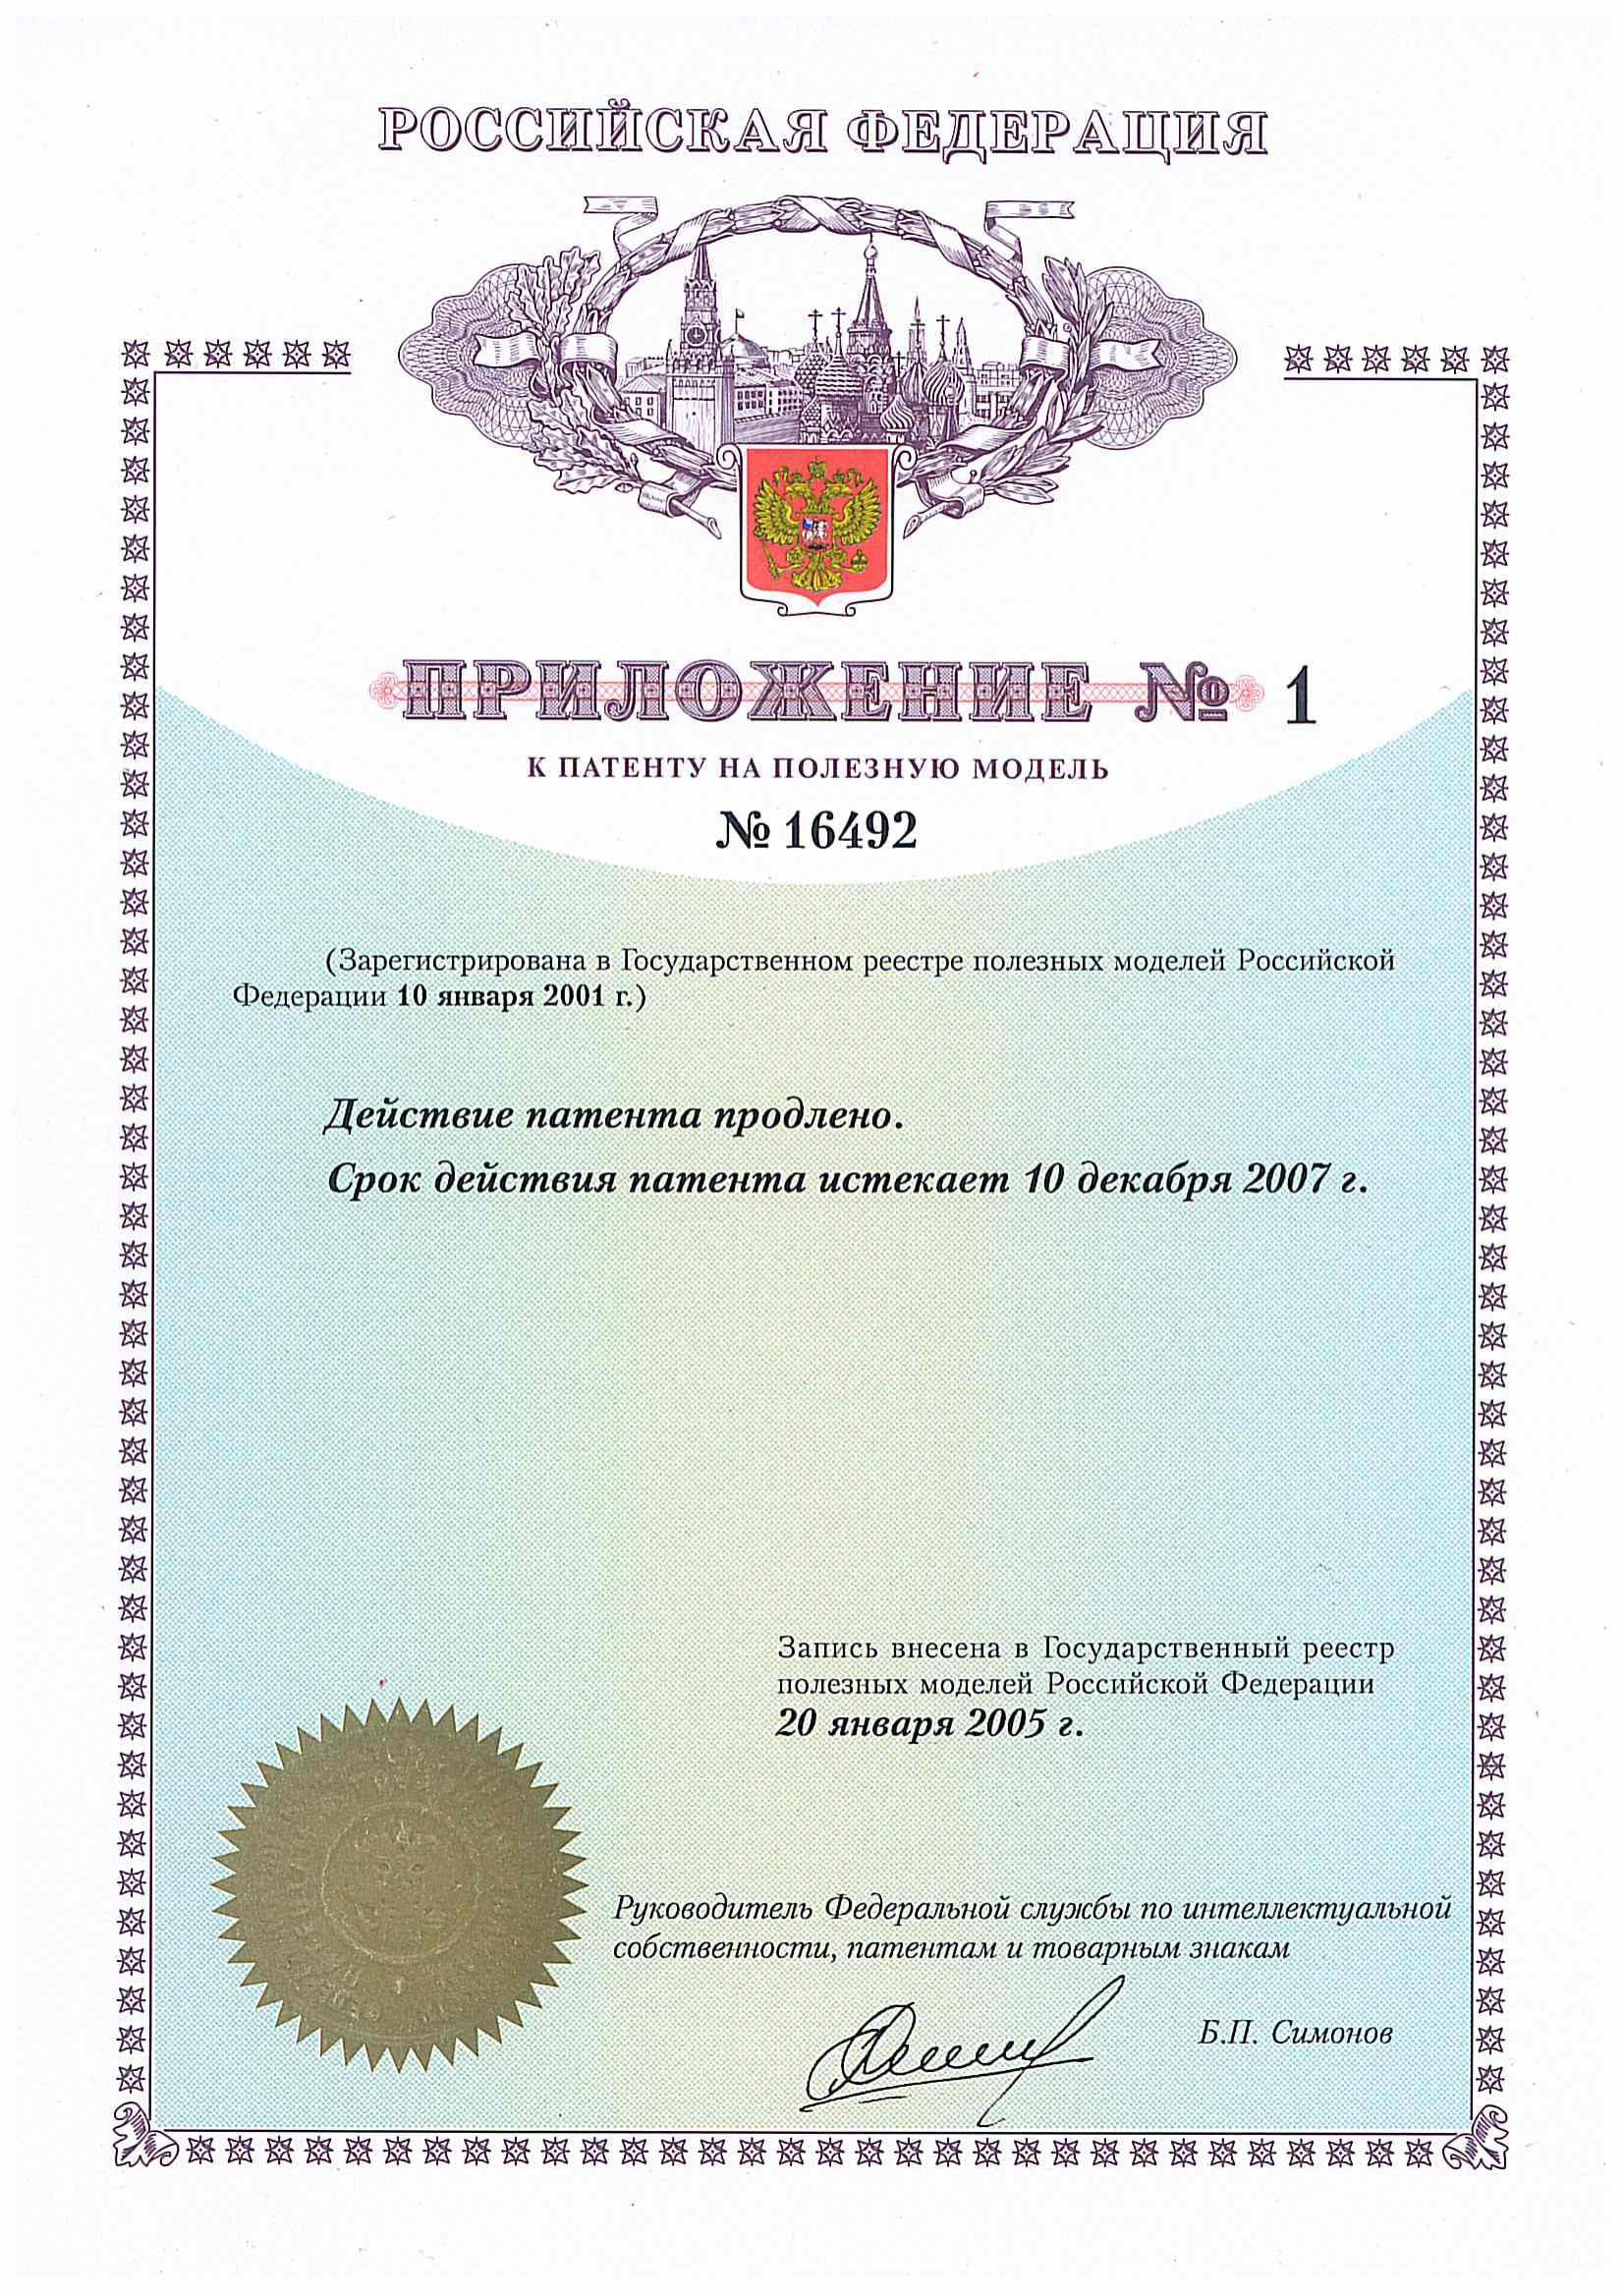 Патент на работу для граждан Украины в 2018 г 41